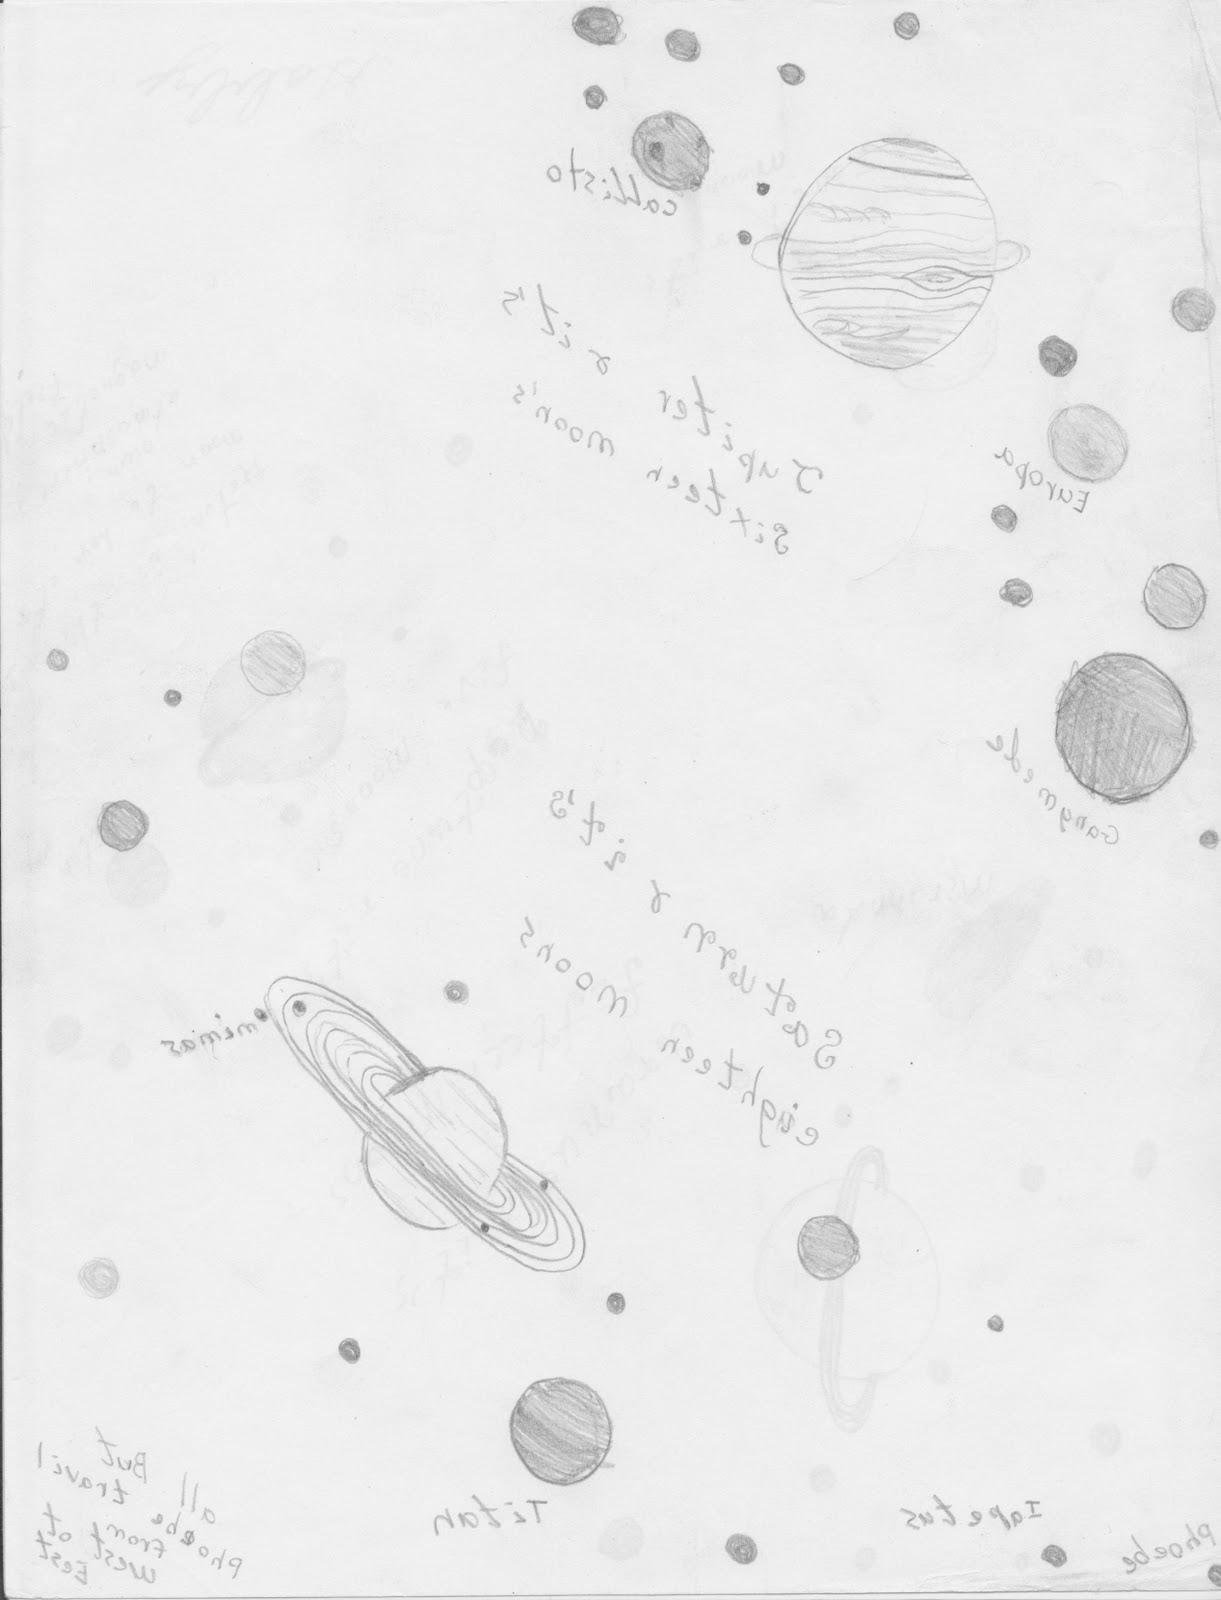 pencil drawn planets - photo #12